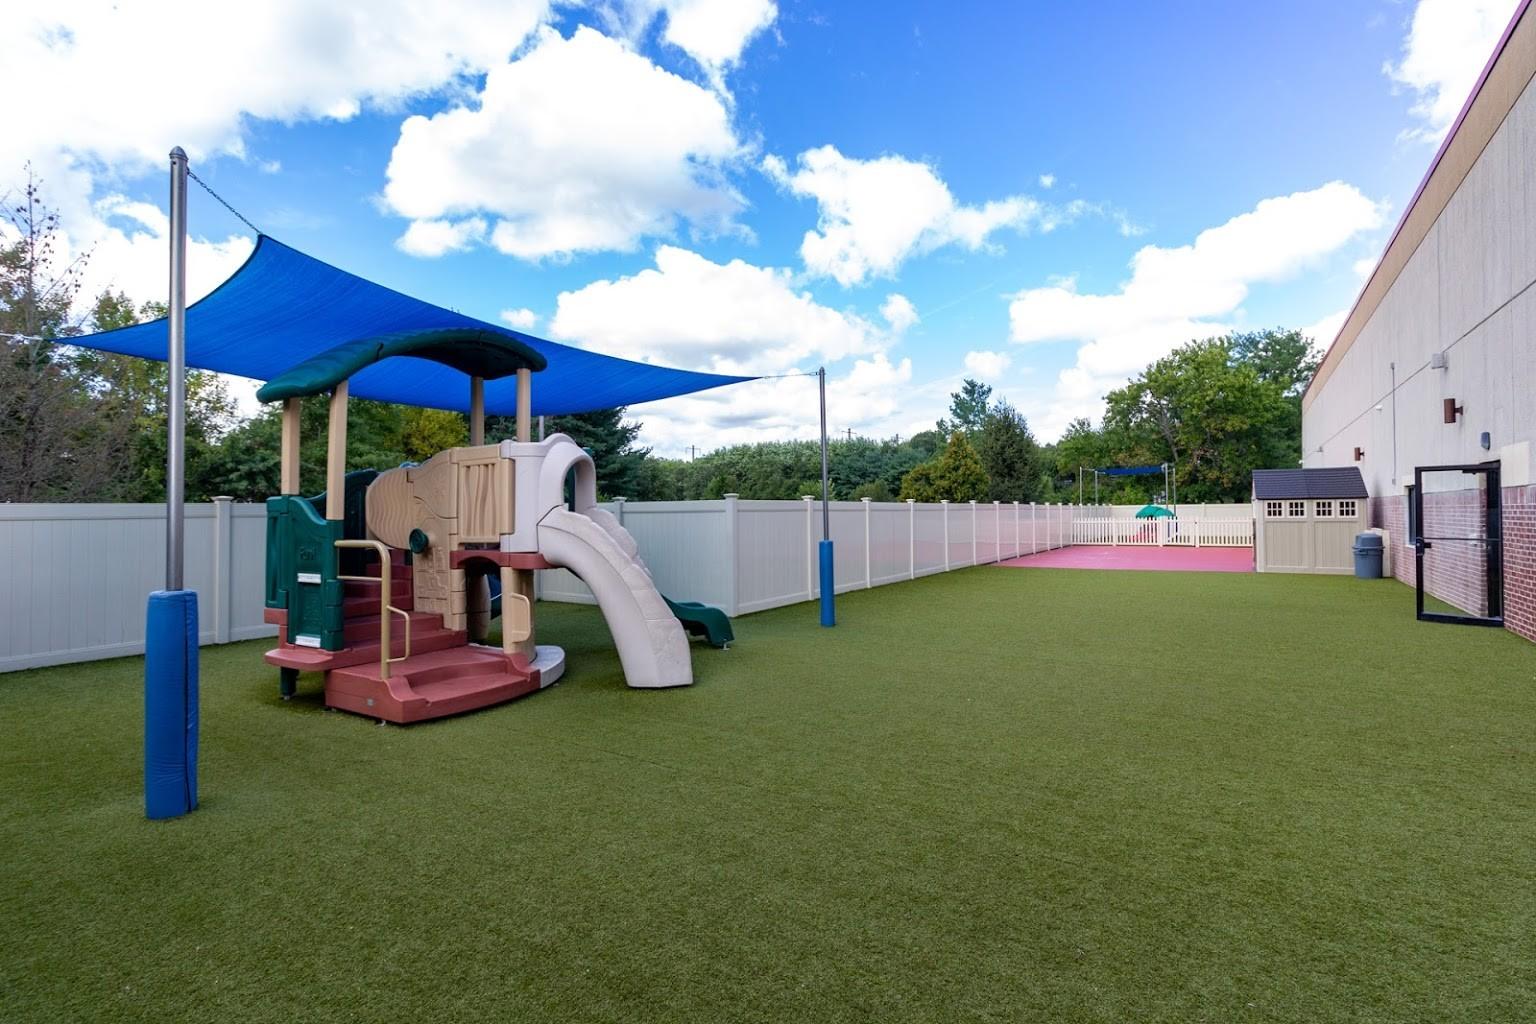 playground at Lightbridge Academy Day Care in Plainsboro, NJ